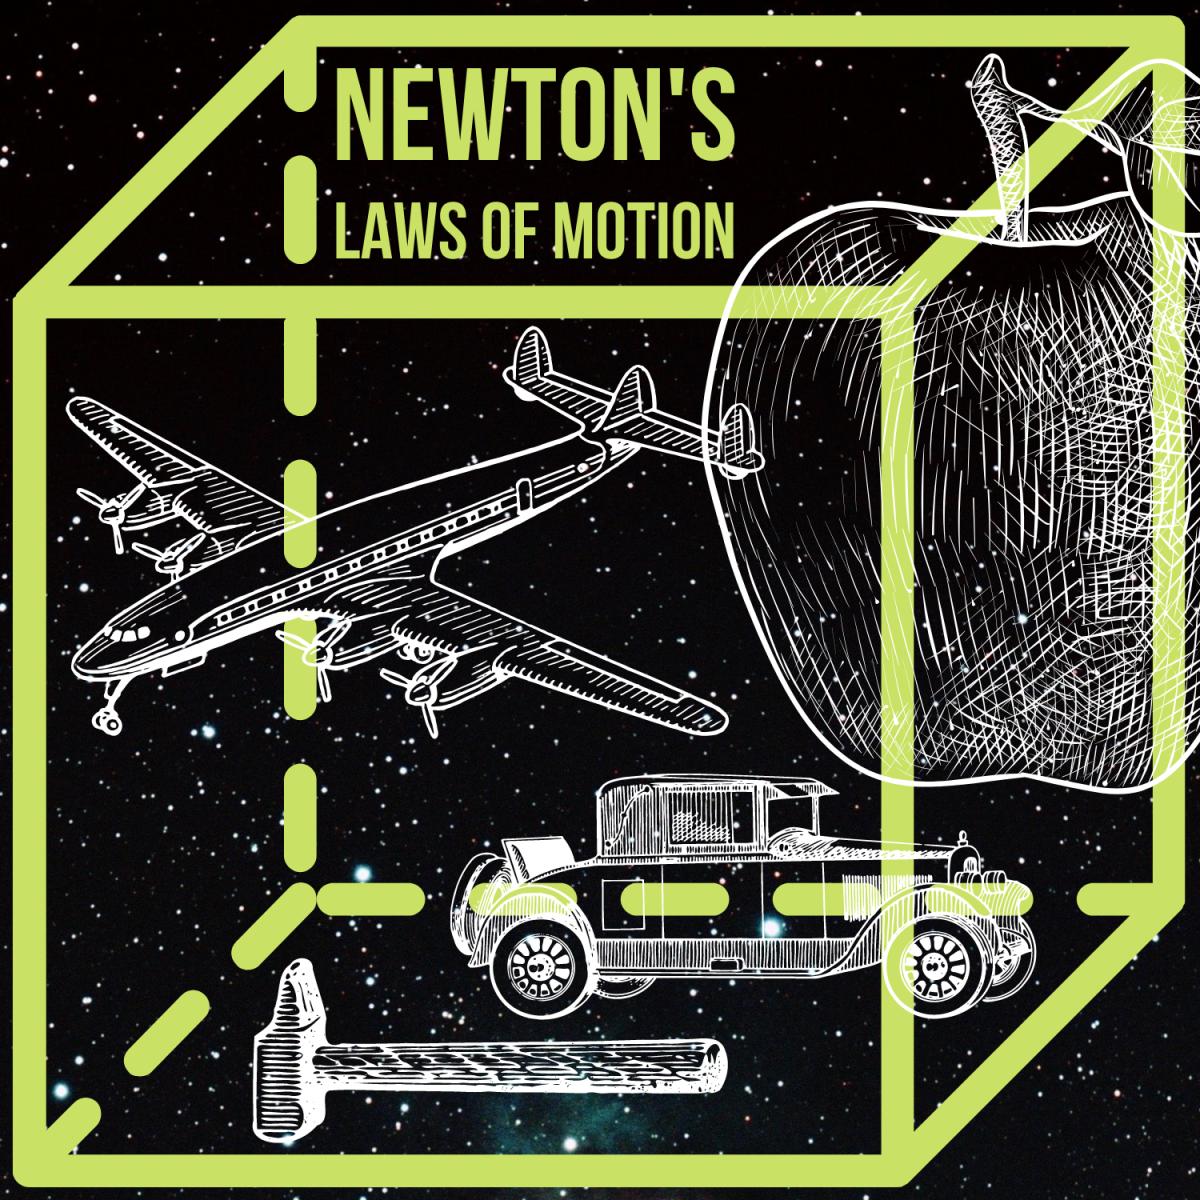 Explore Newton's 3 Laws of Motion